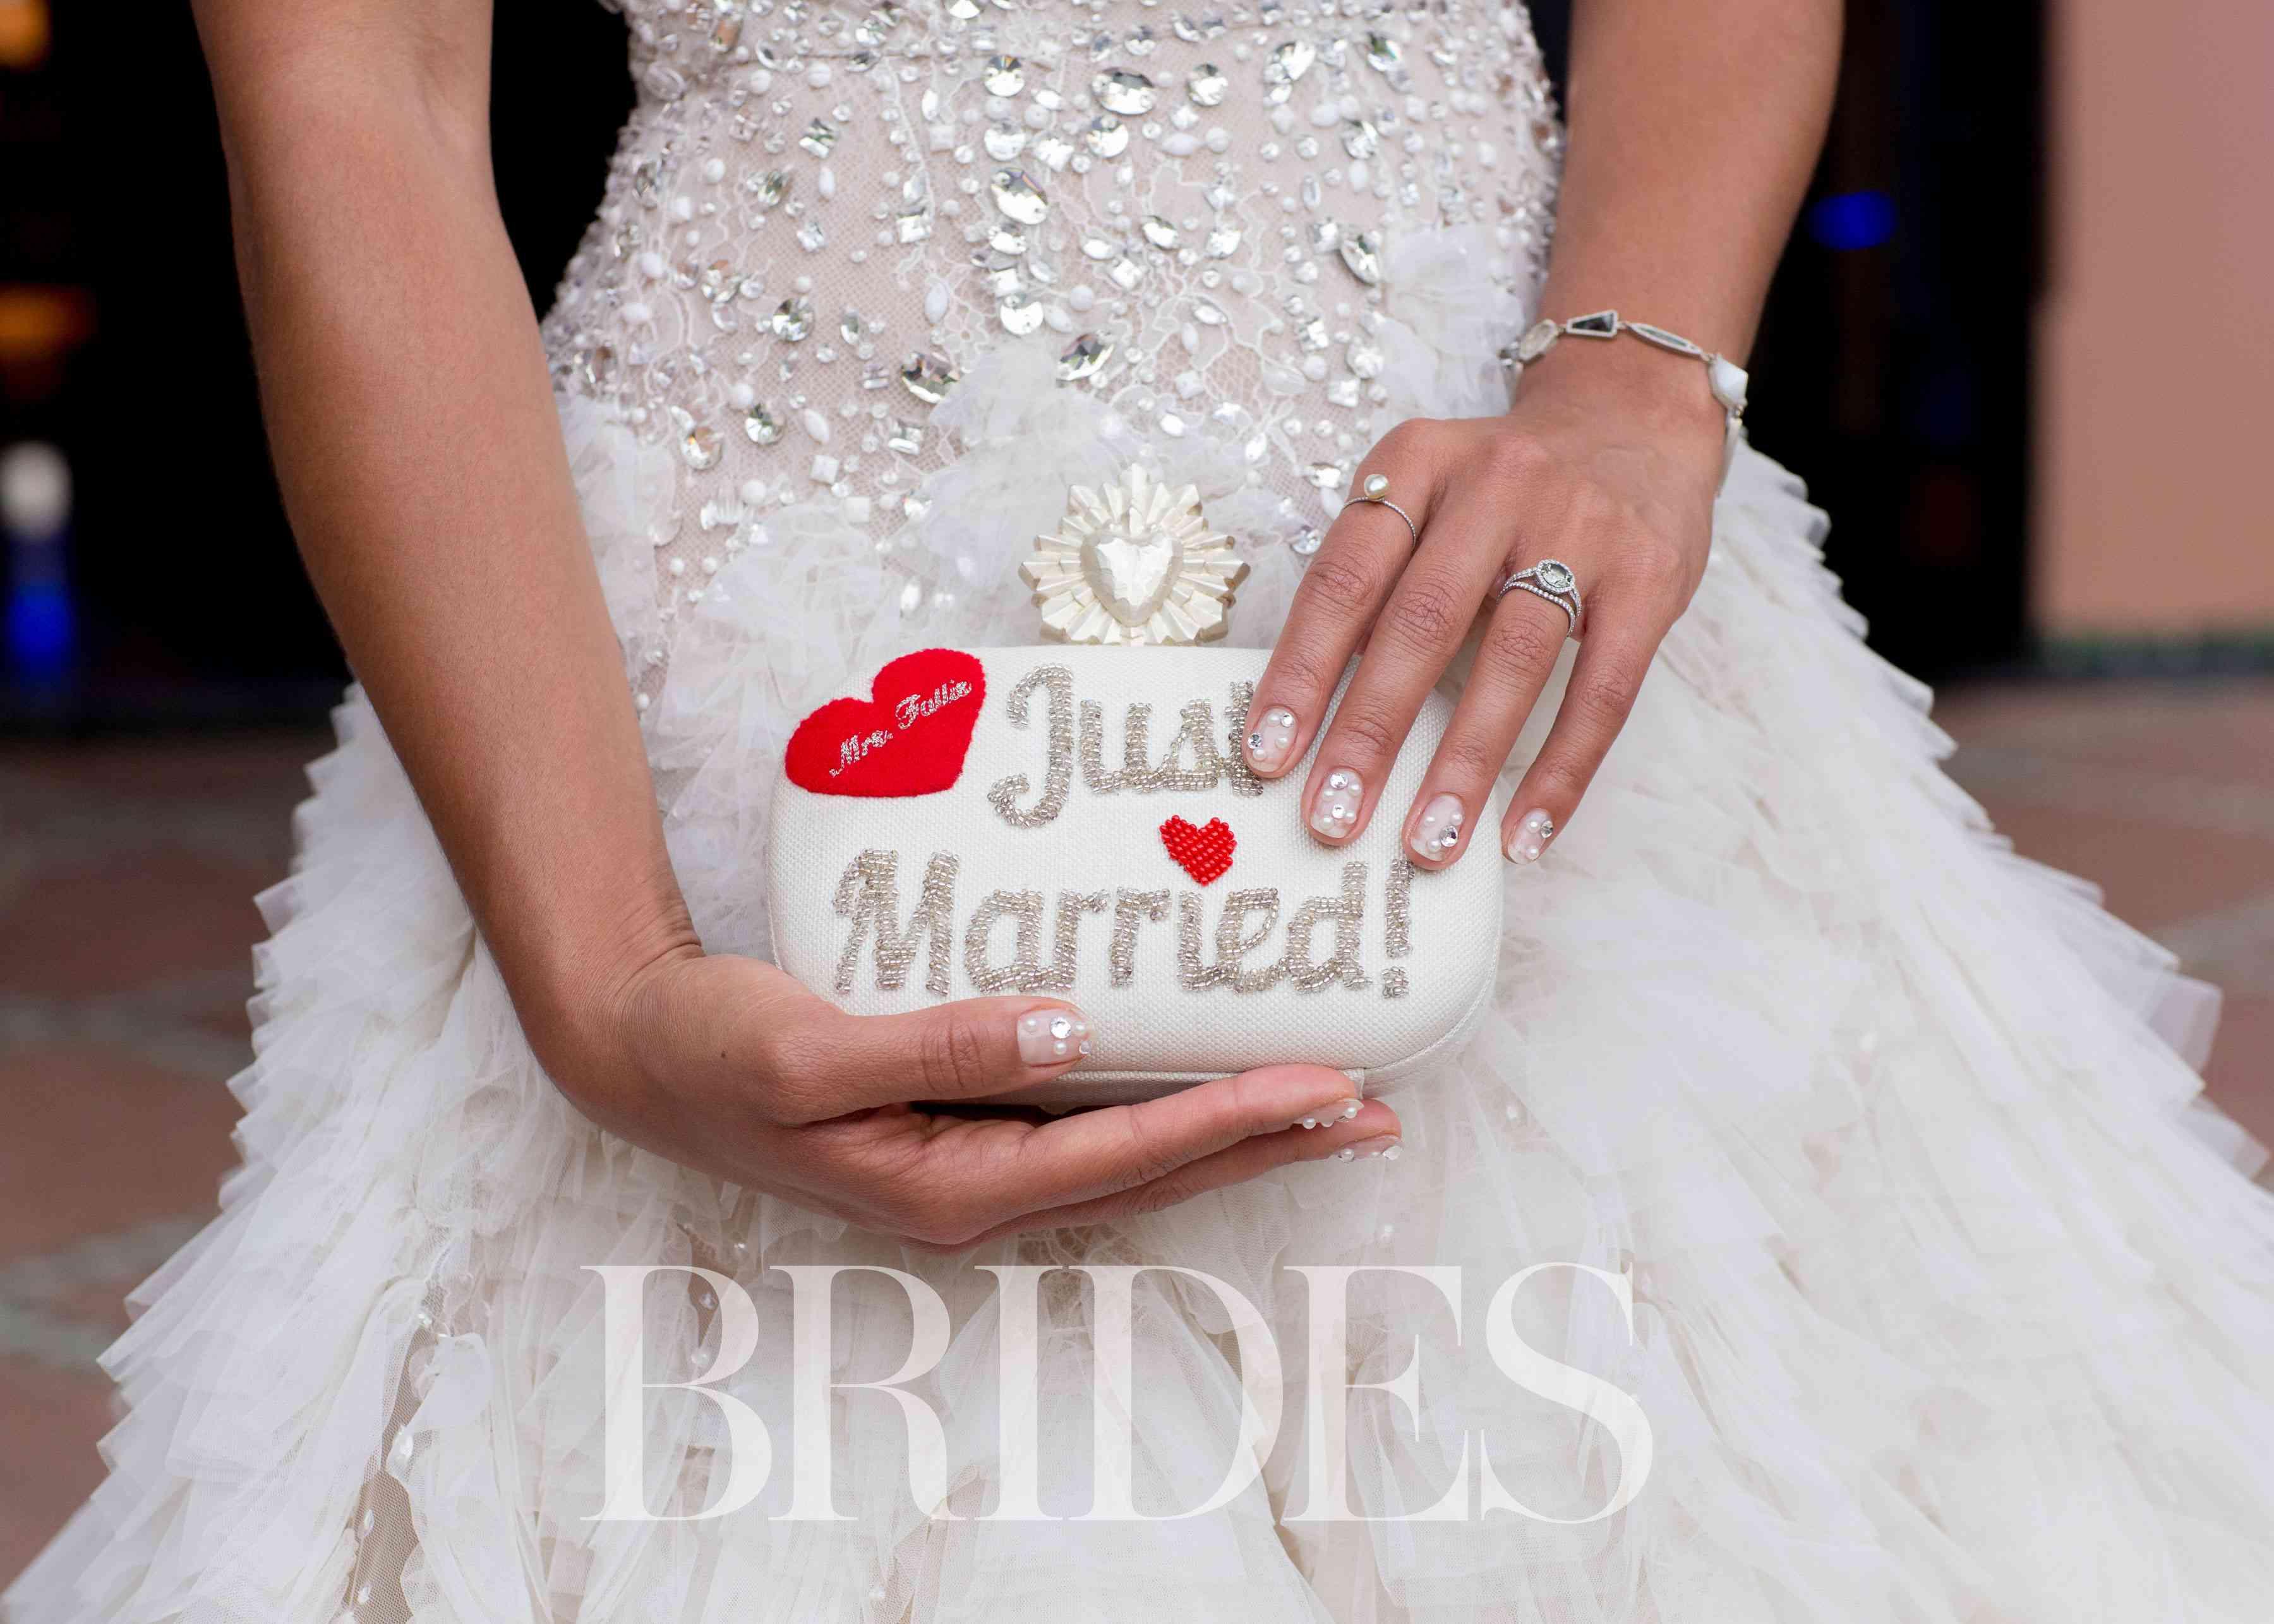 Hannah Bronfman Wedding, Just Married Clutch